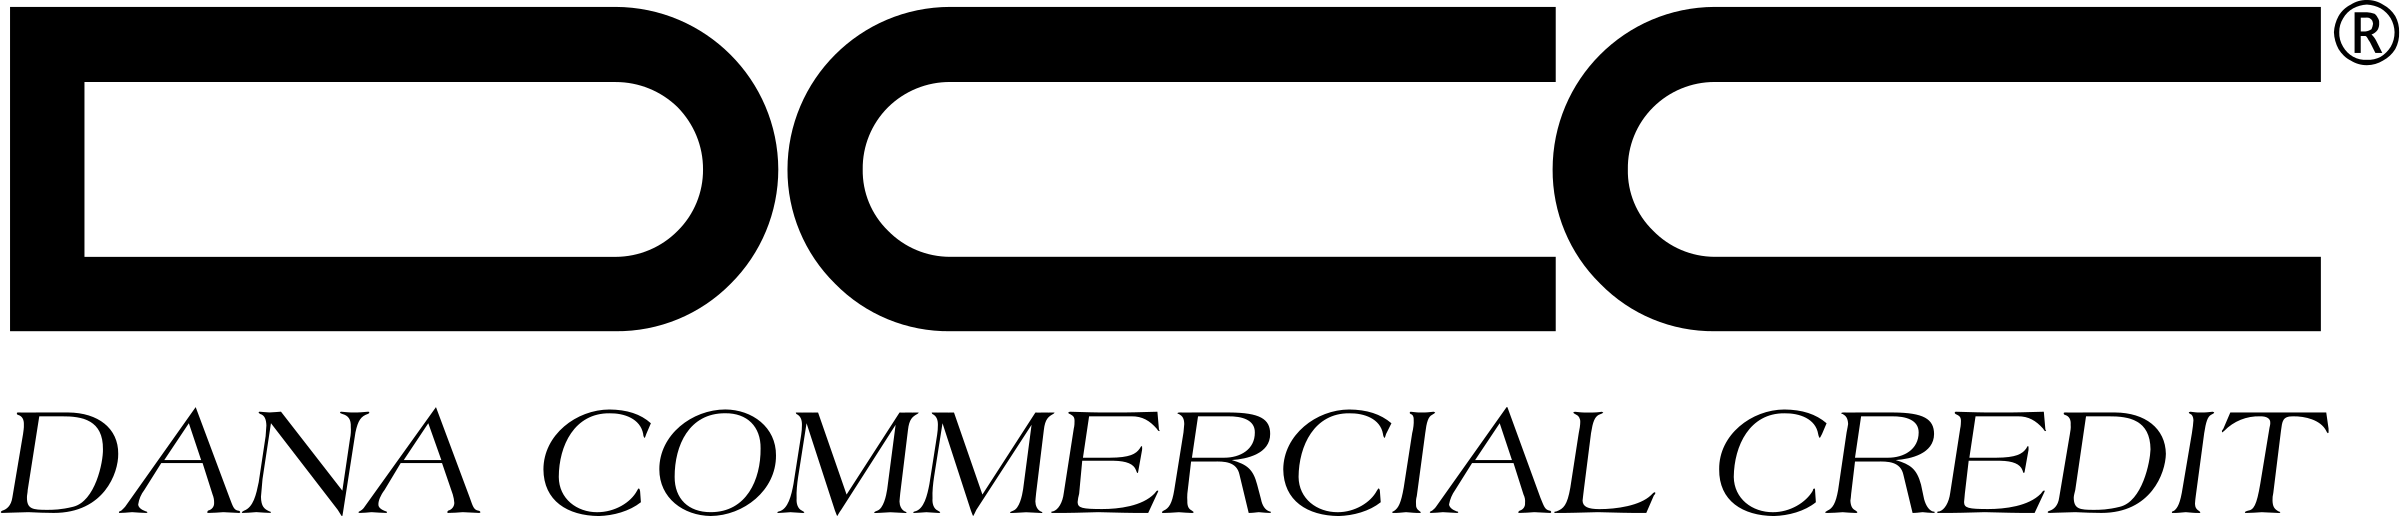 dana commercial credit logo png transparent svg vector freebie supply freebie supply